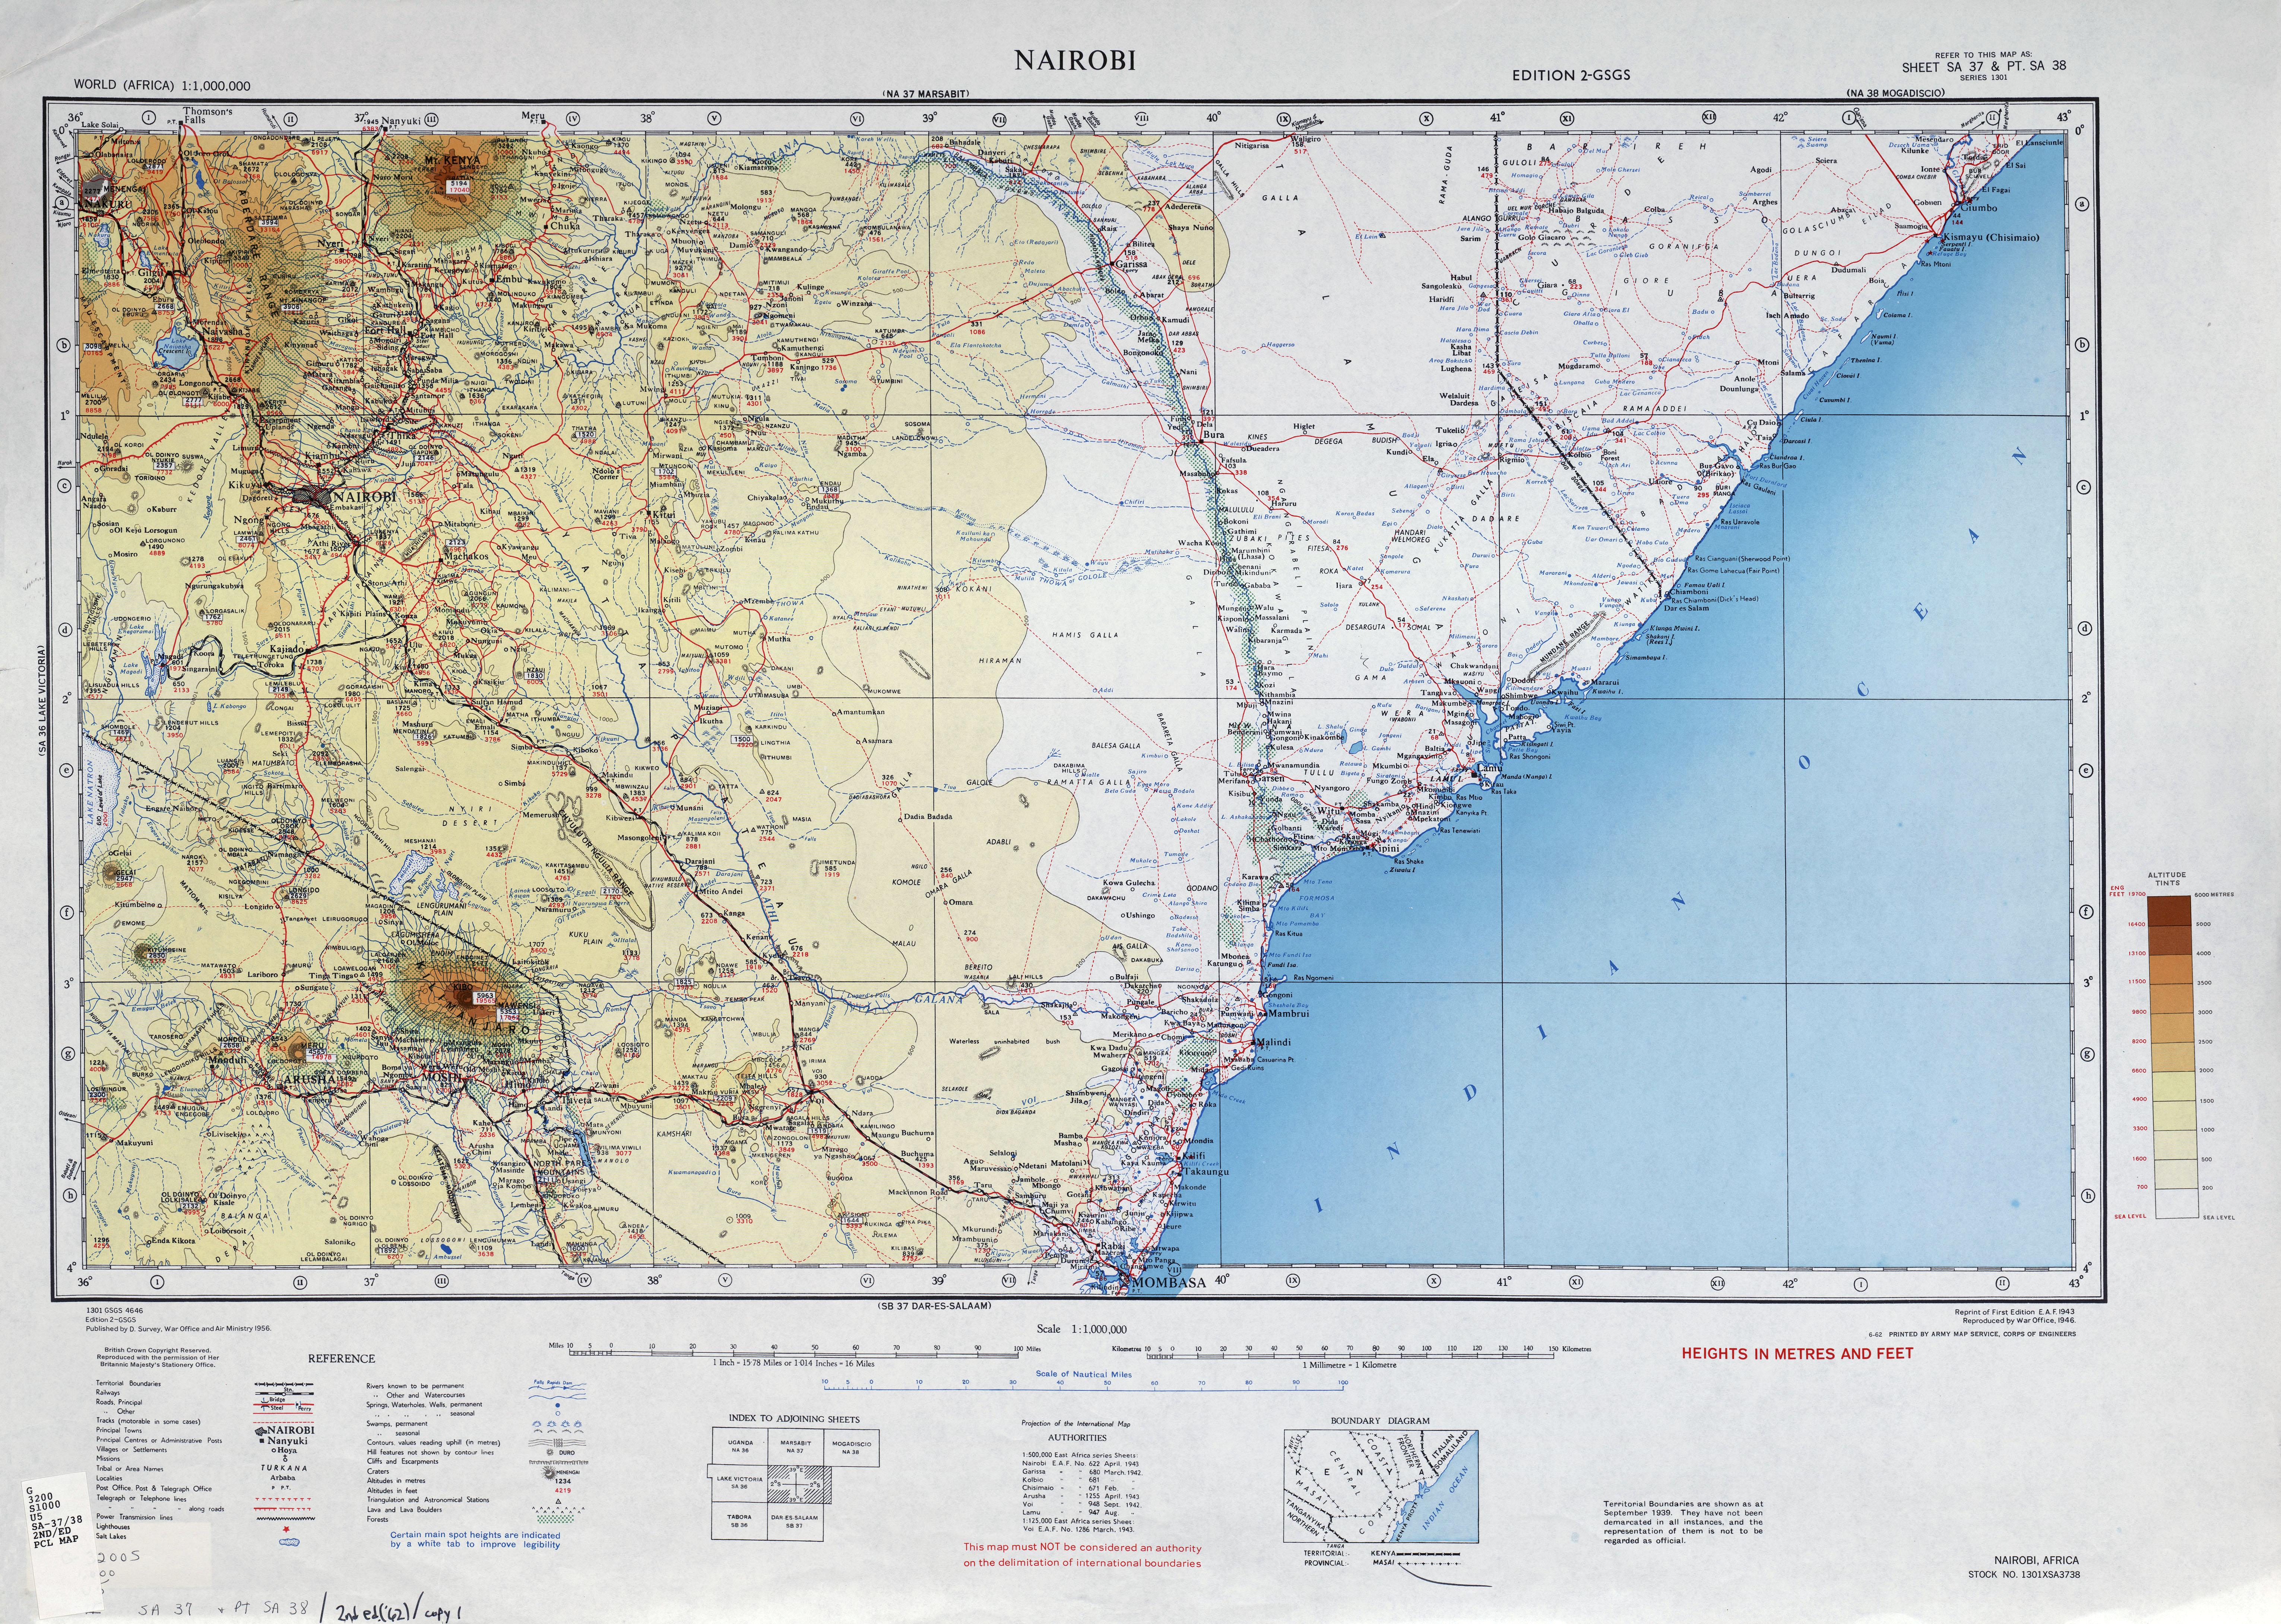 Kenya colony 1955 map of nairobi region gumiabroncs Choice Image